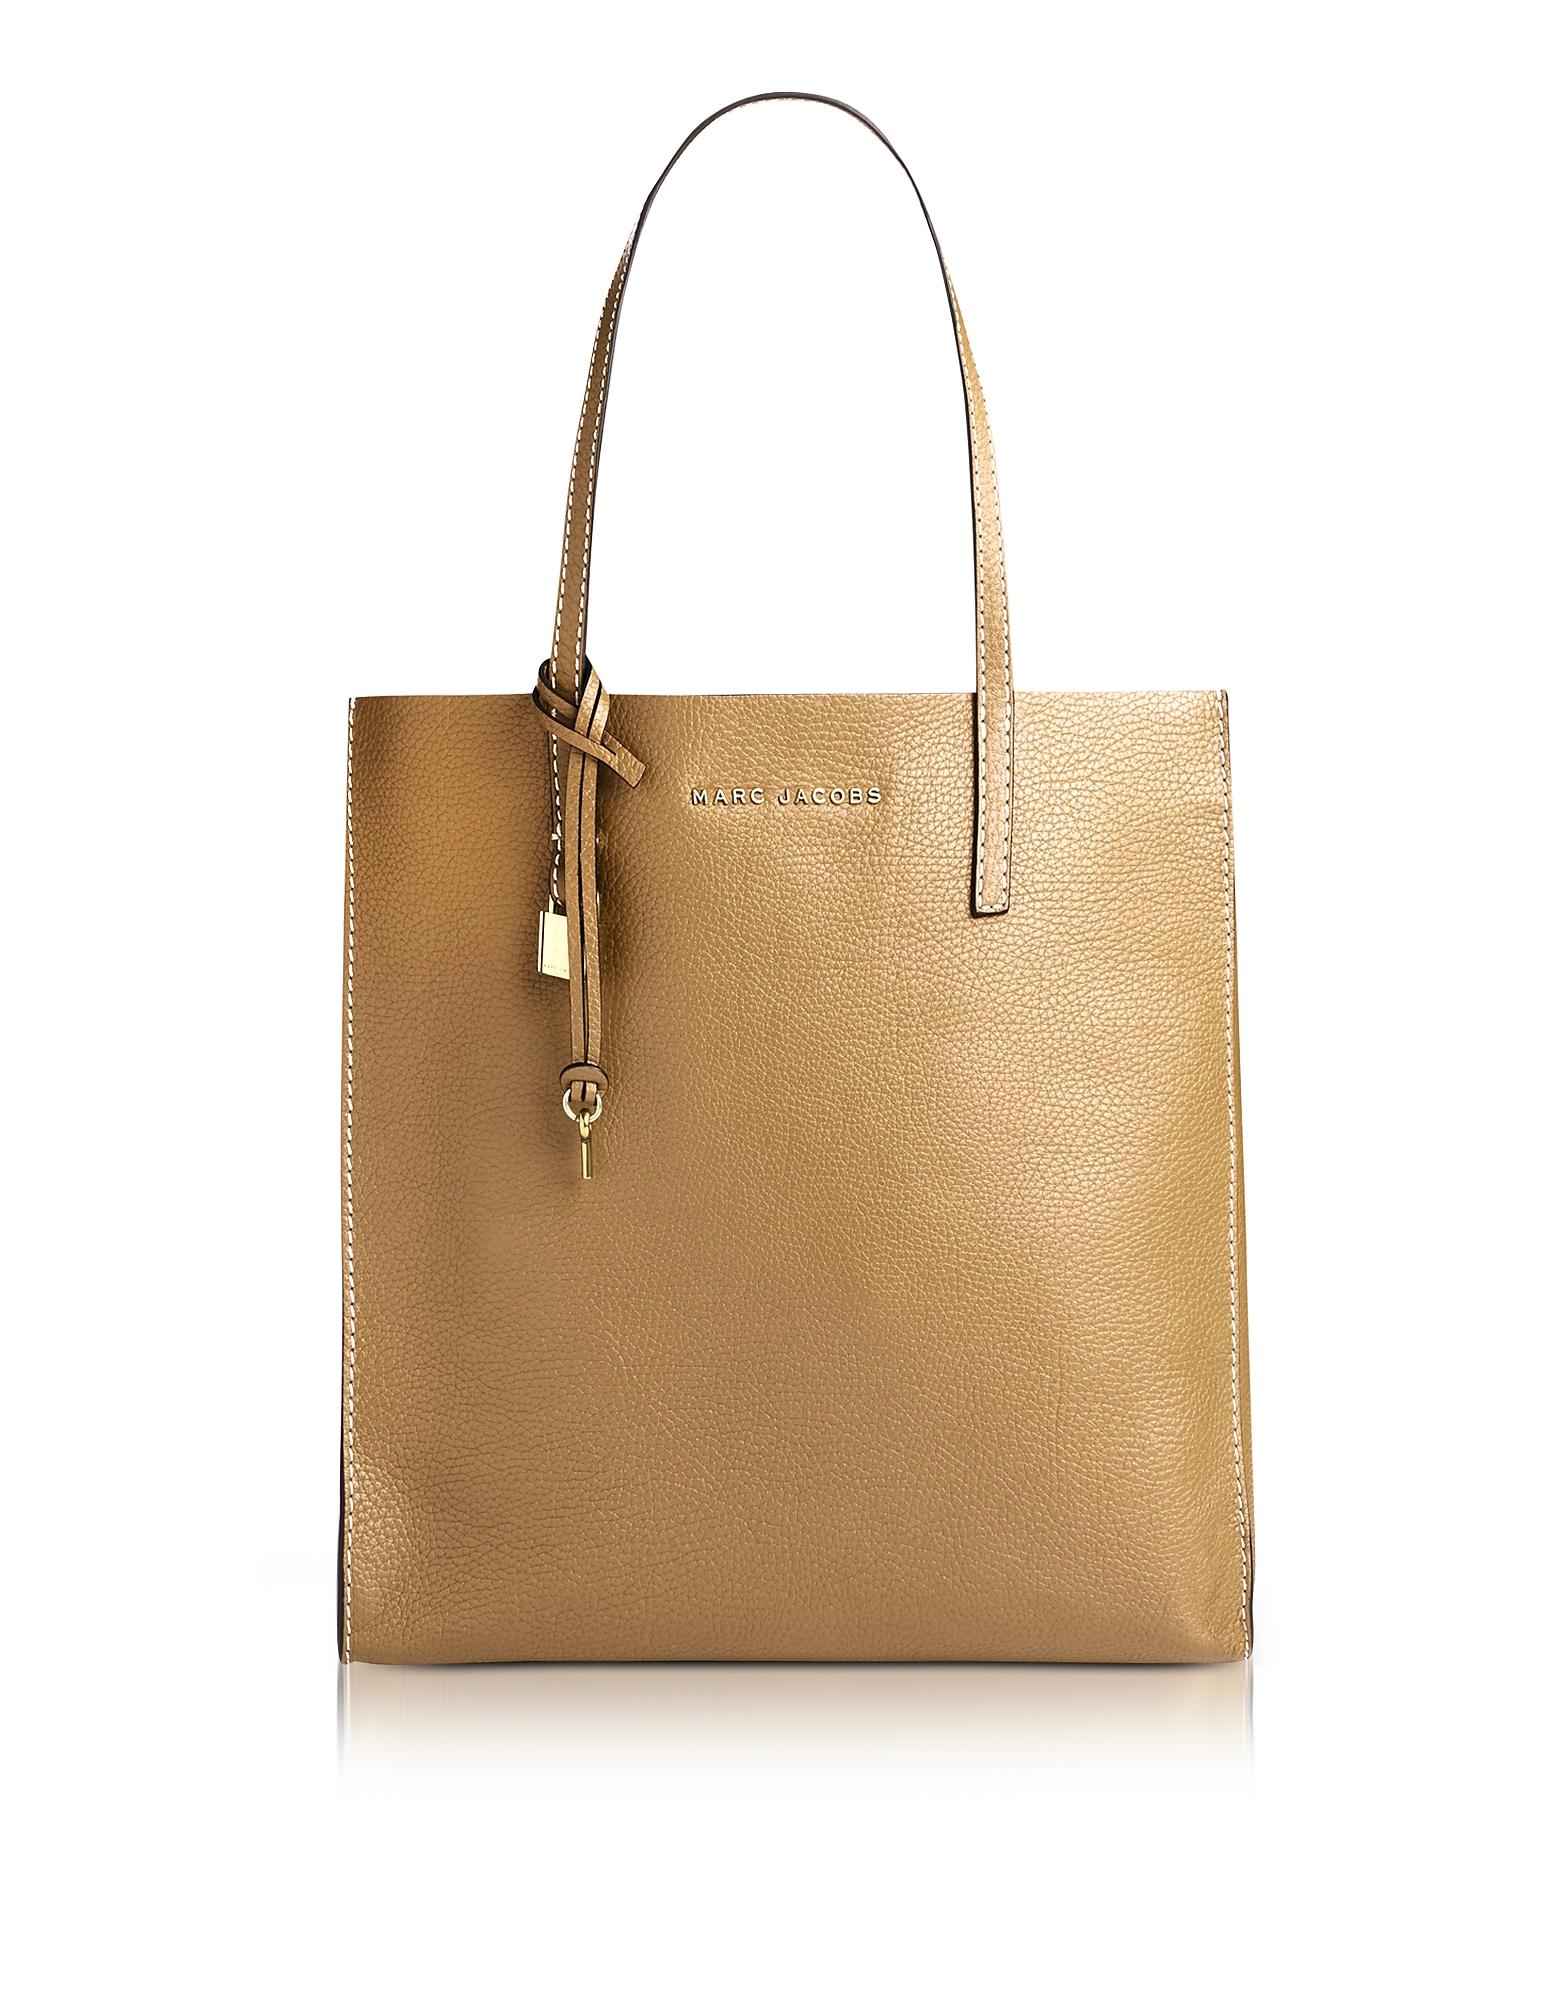 Marc Jacobs Handbags, Golden Beige Leather The Grind Shopper Tote Bag